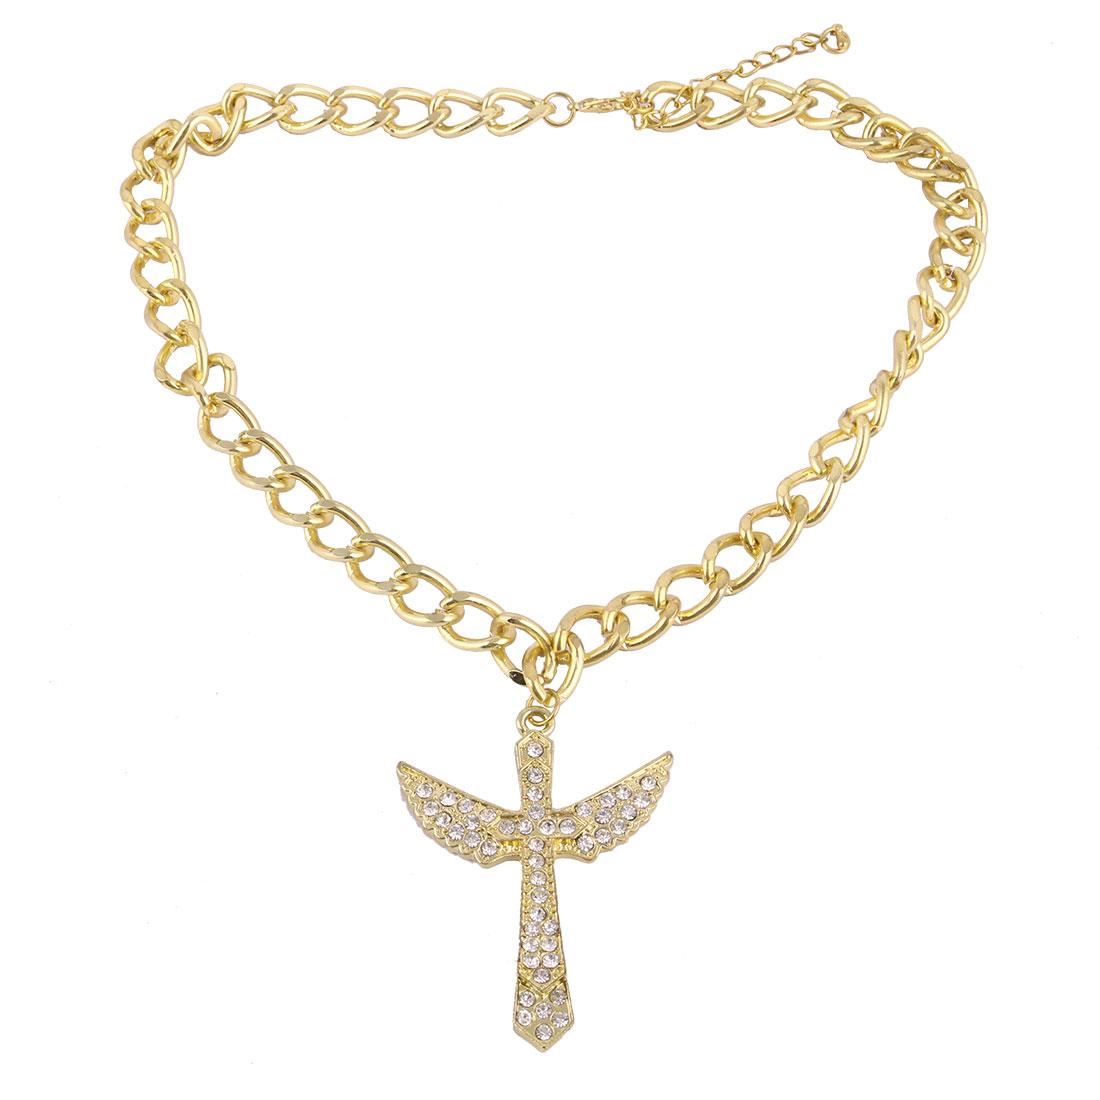 Rhinestone Inlaid Glitter Cross Pendant Neck Chain Choker Necklace Decor